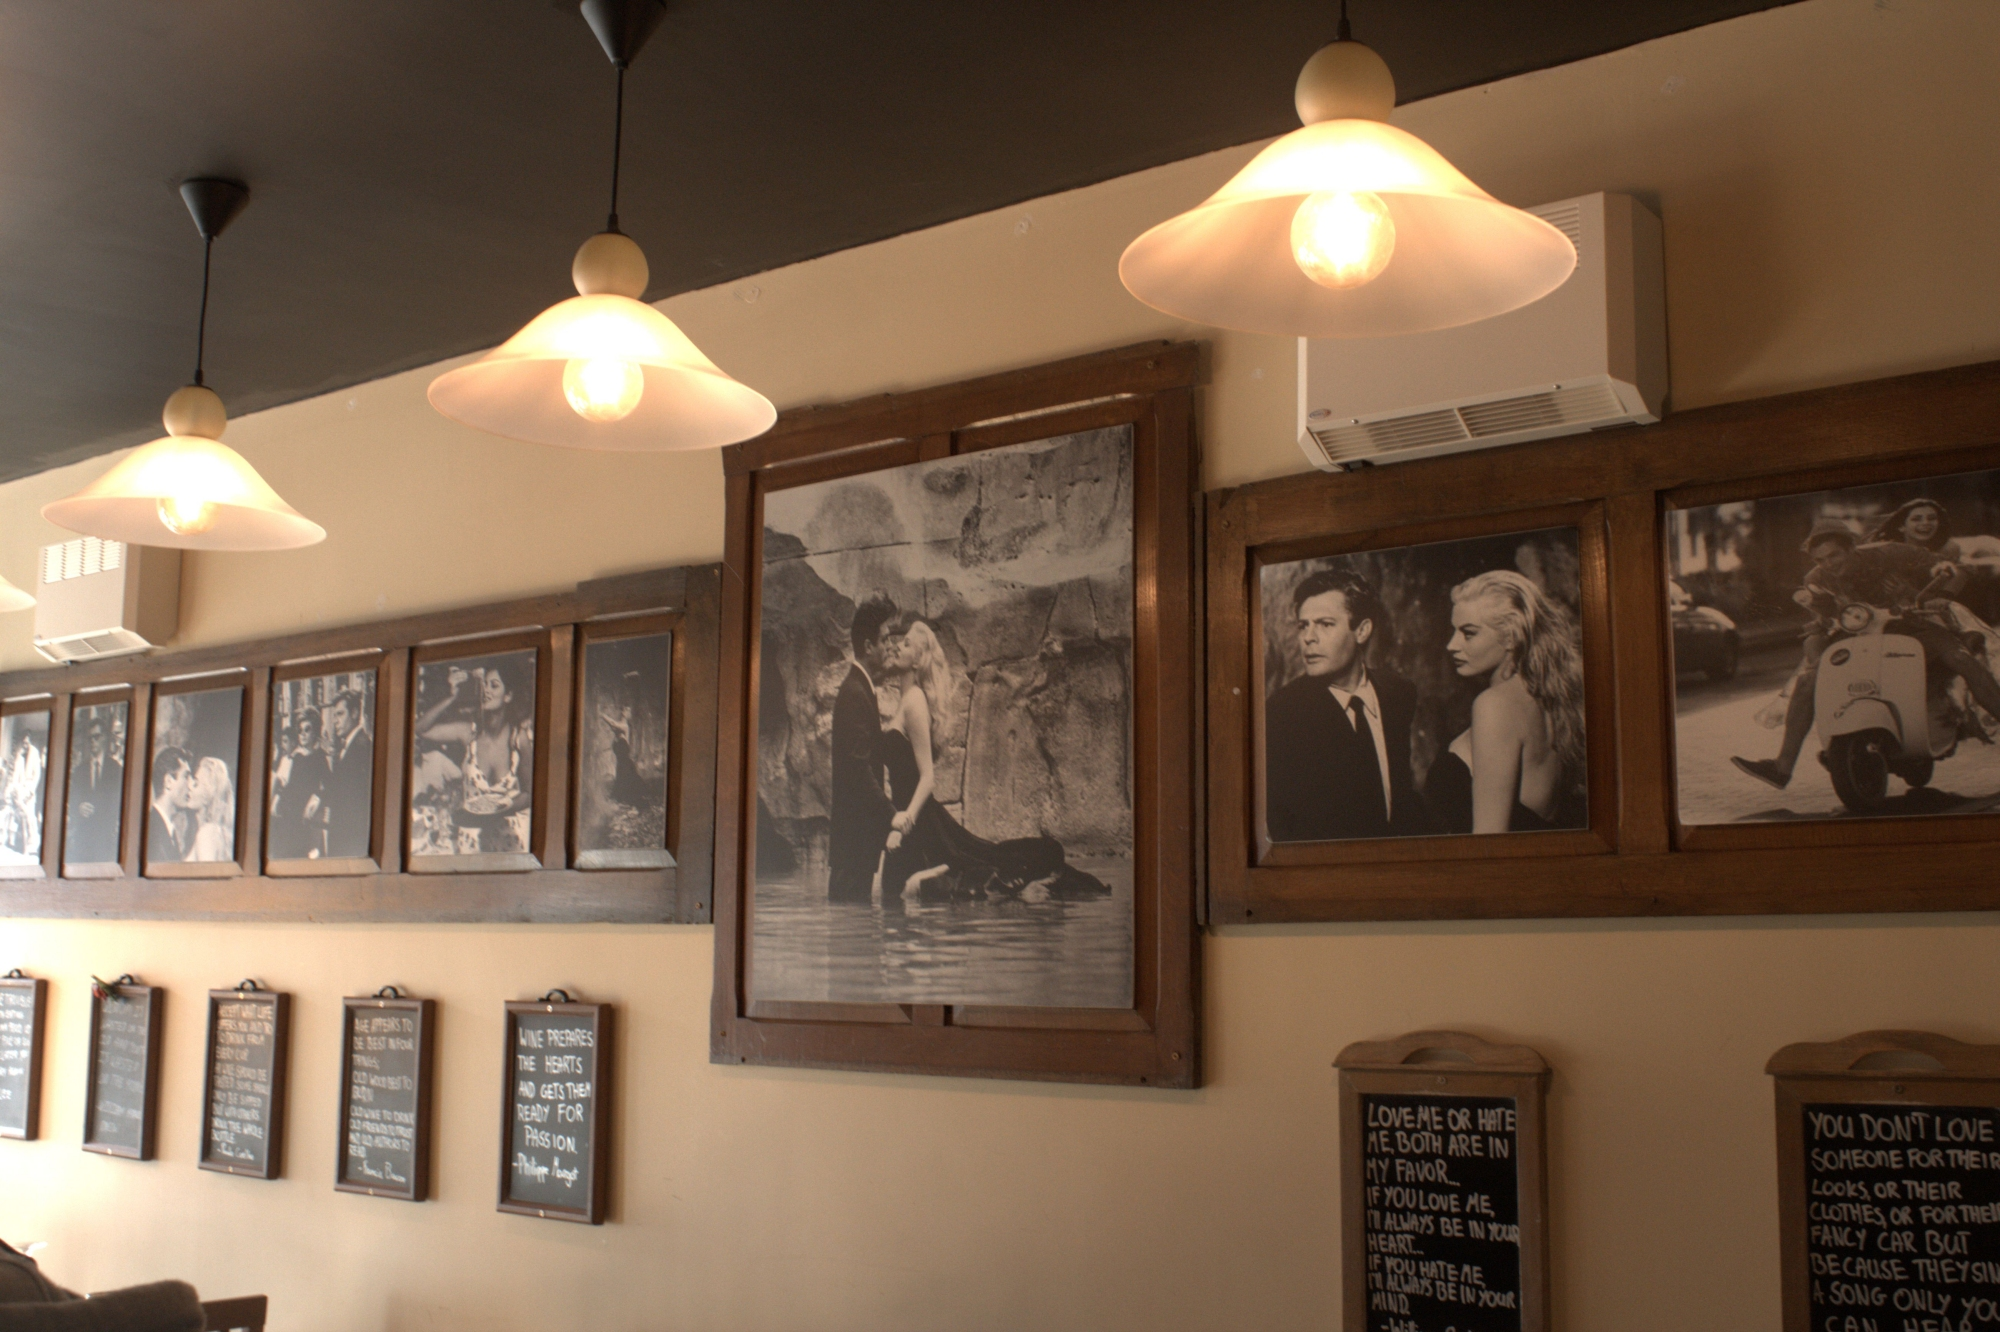 dolce-vita-italian-restaurant-poole-1